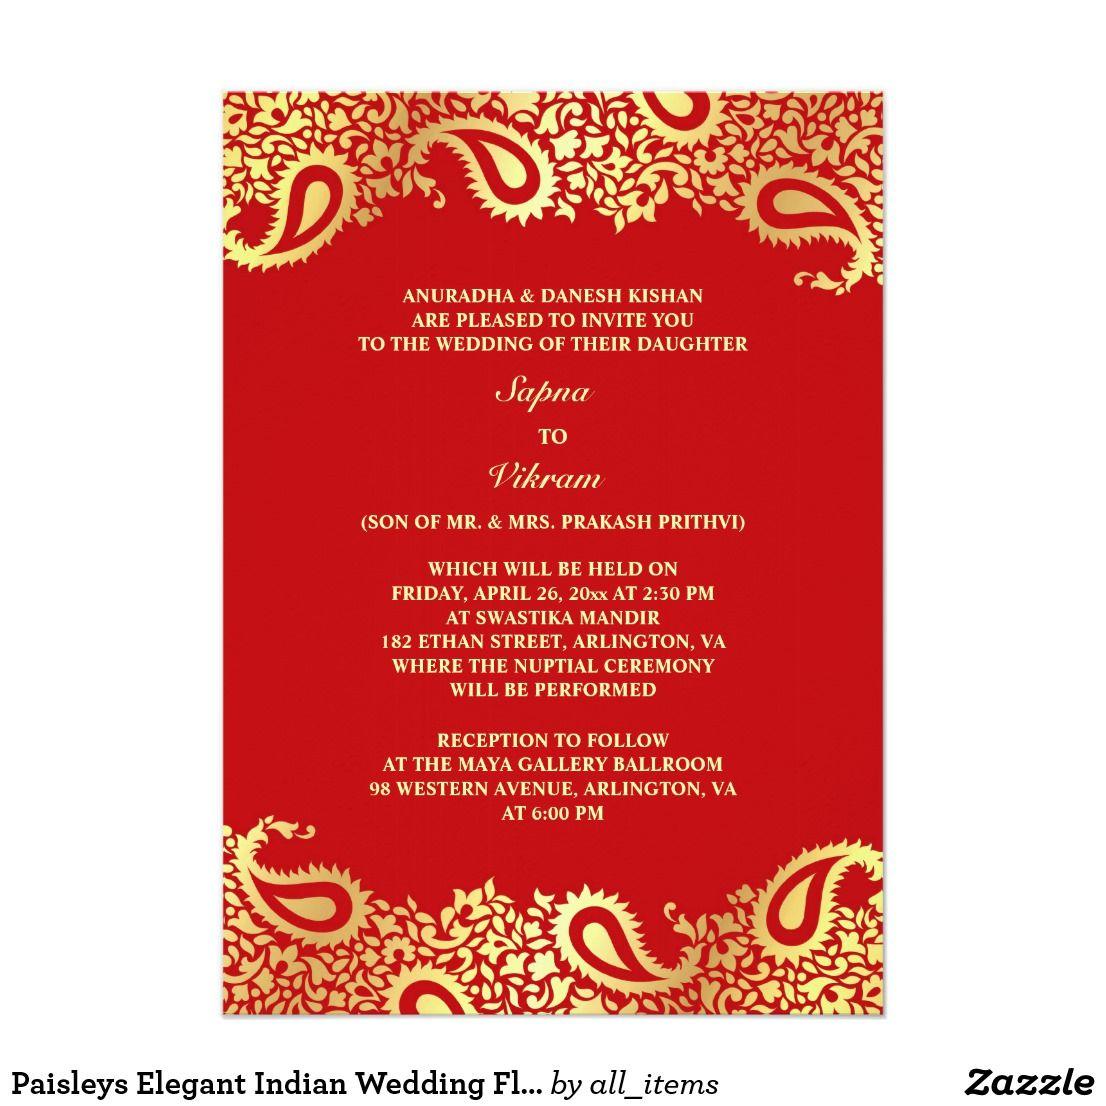 Paisleys Elegant Indian Wedding Flat Invitation | Wedding flats ...